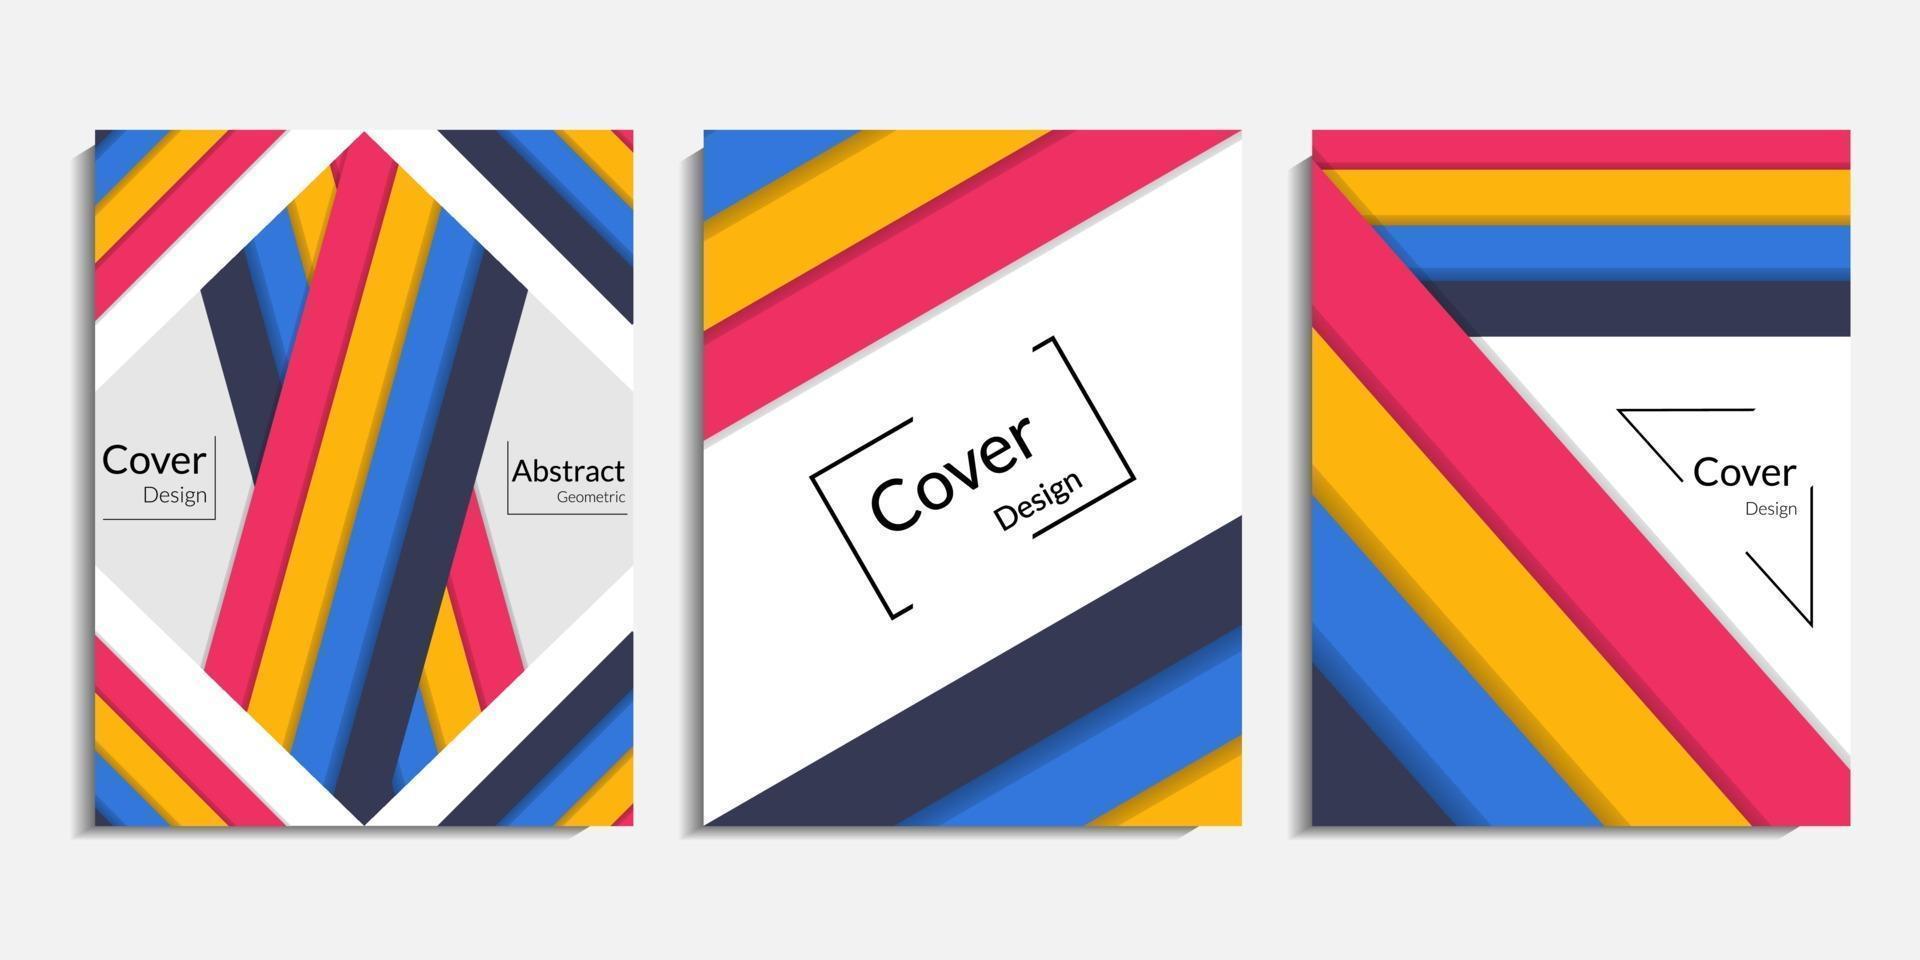 omslagontwerp, moderne abstracte minimalistische achtergrond vector